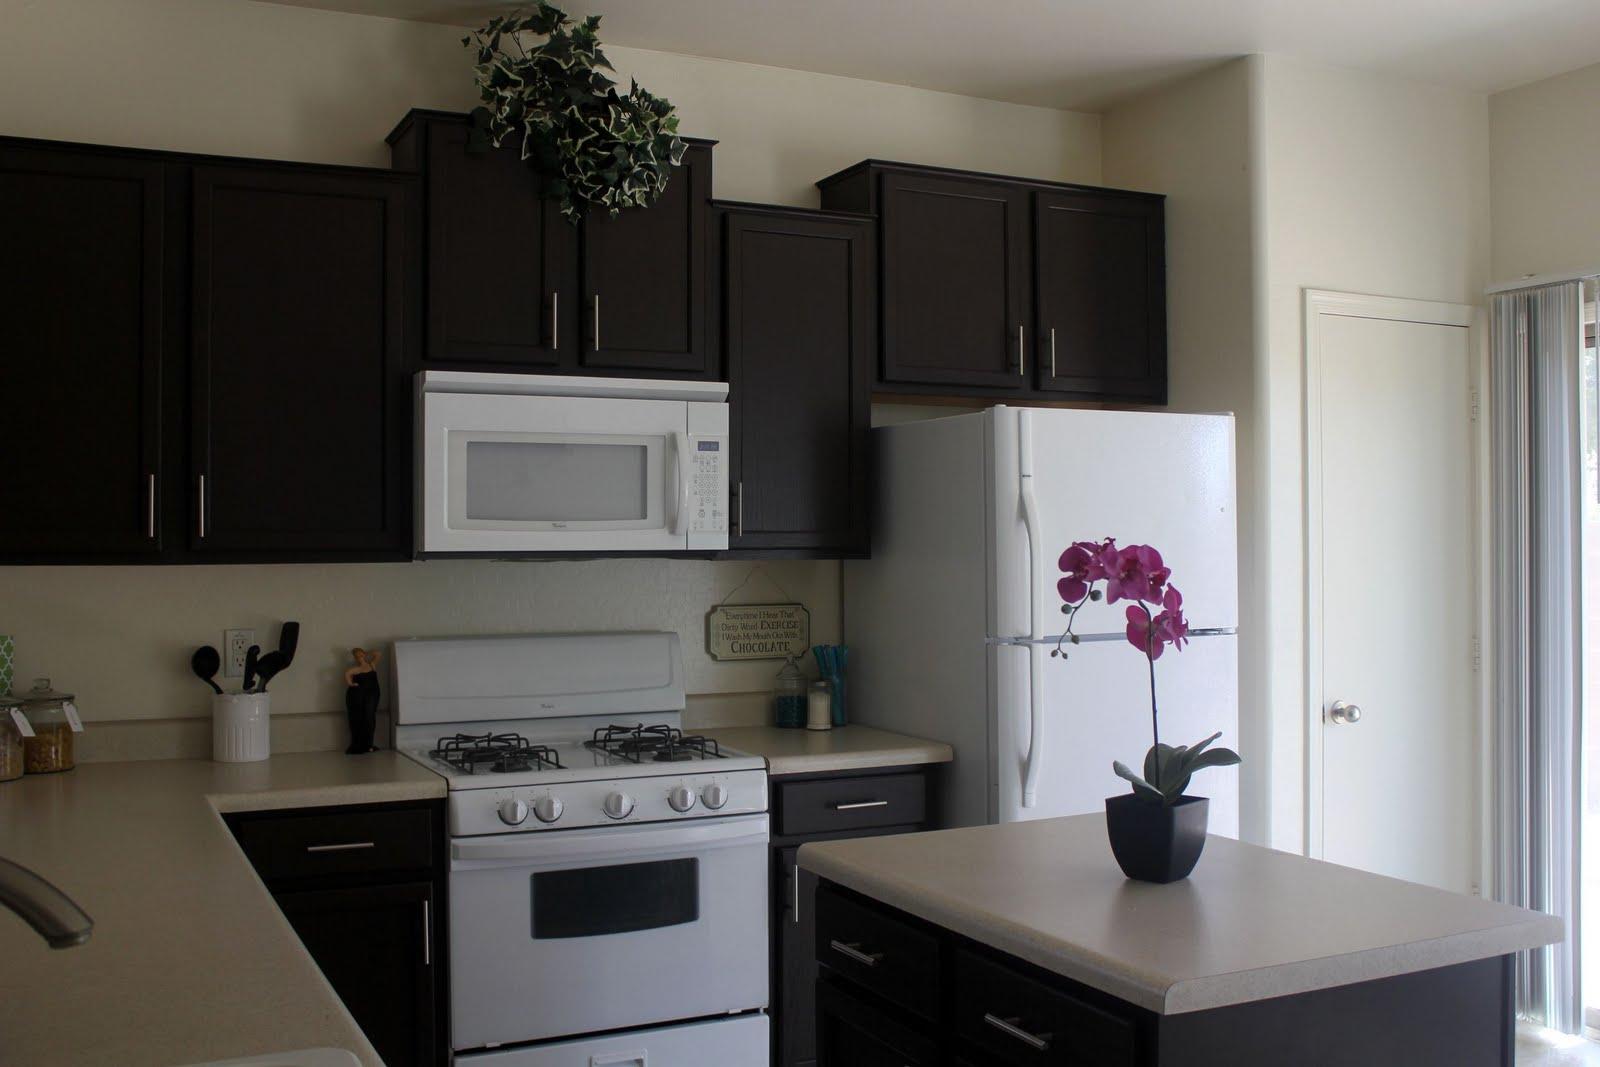 Kitchen Cabinet Makeover Kitchen Cupboard Makeover Step By Step